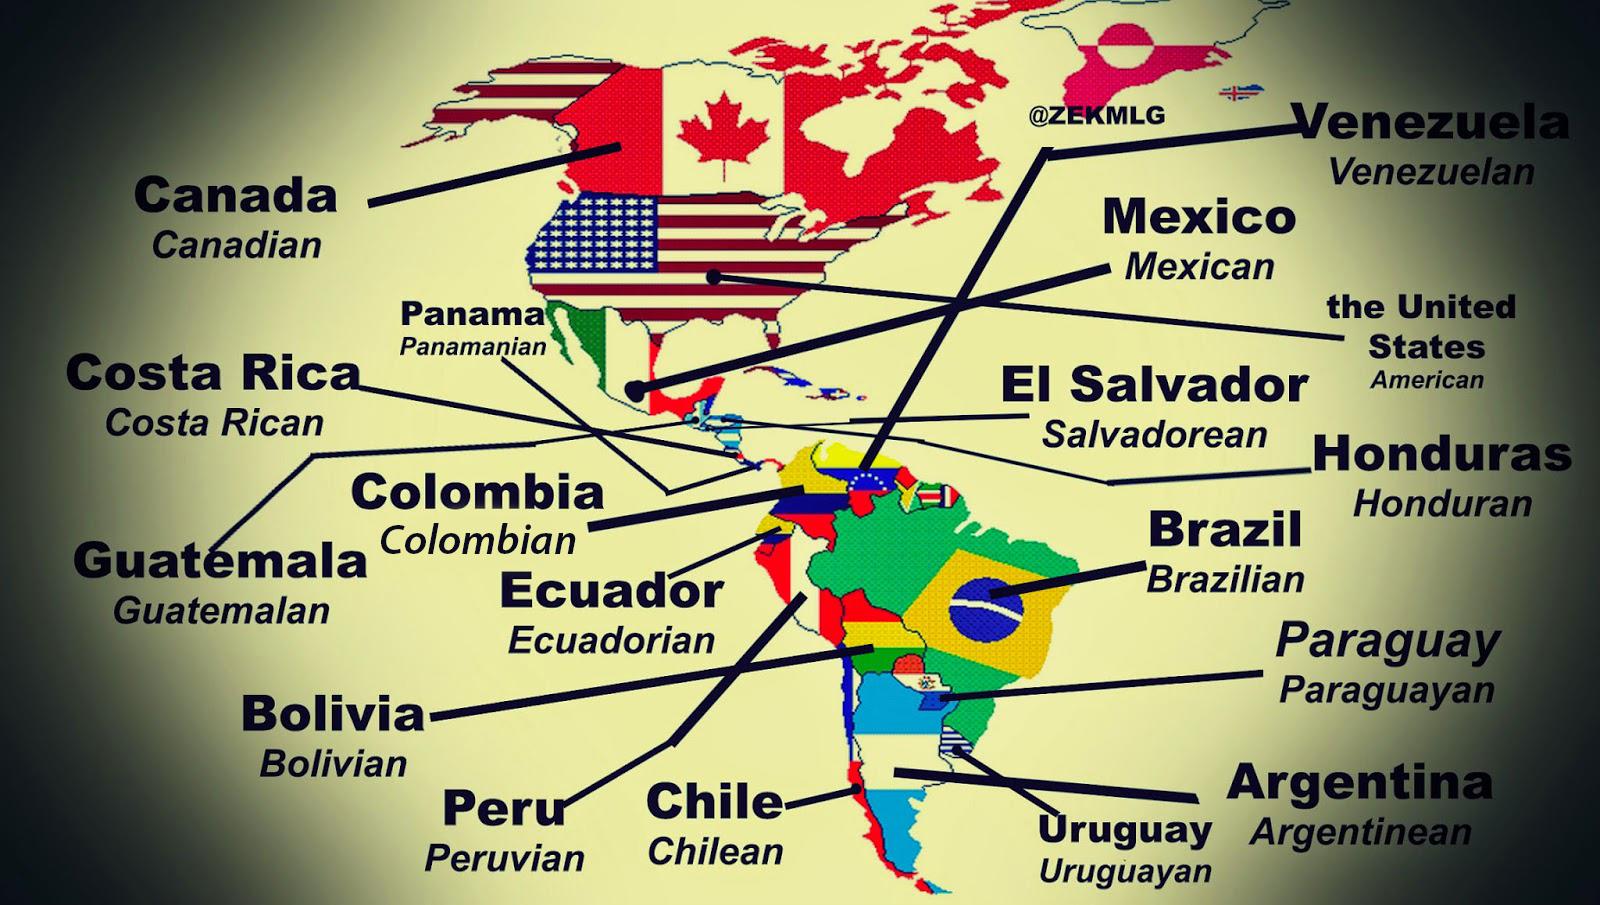 Variando Todo En Todo Mapa De Nacionalidades En Ingles Map Of Nationalities In English